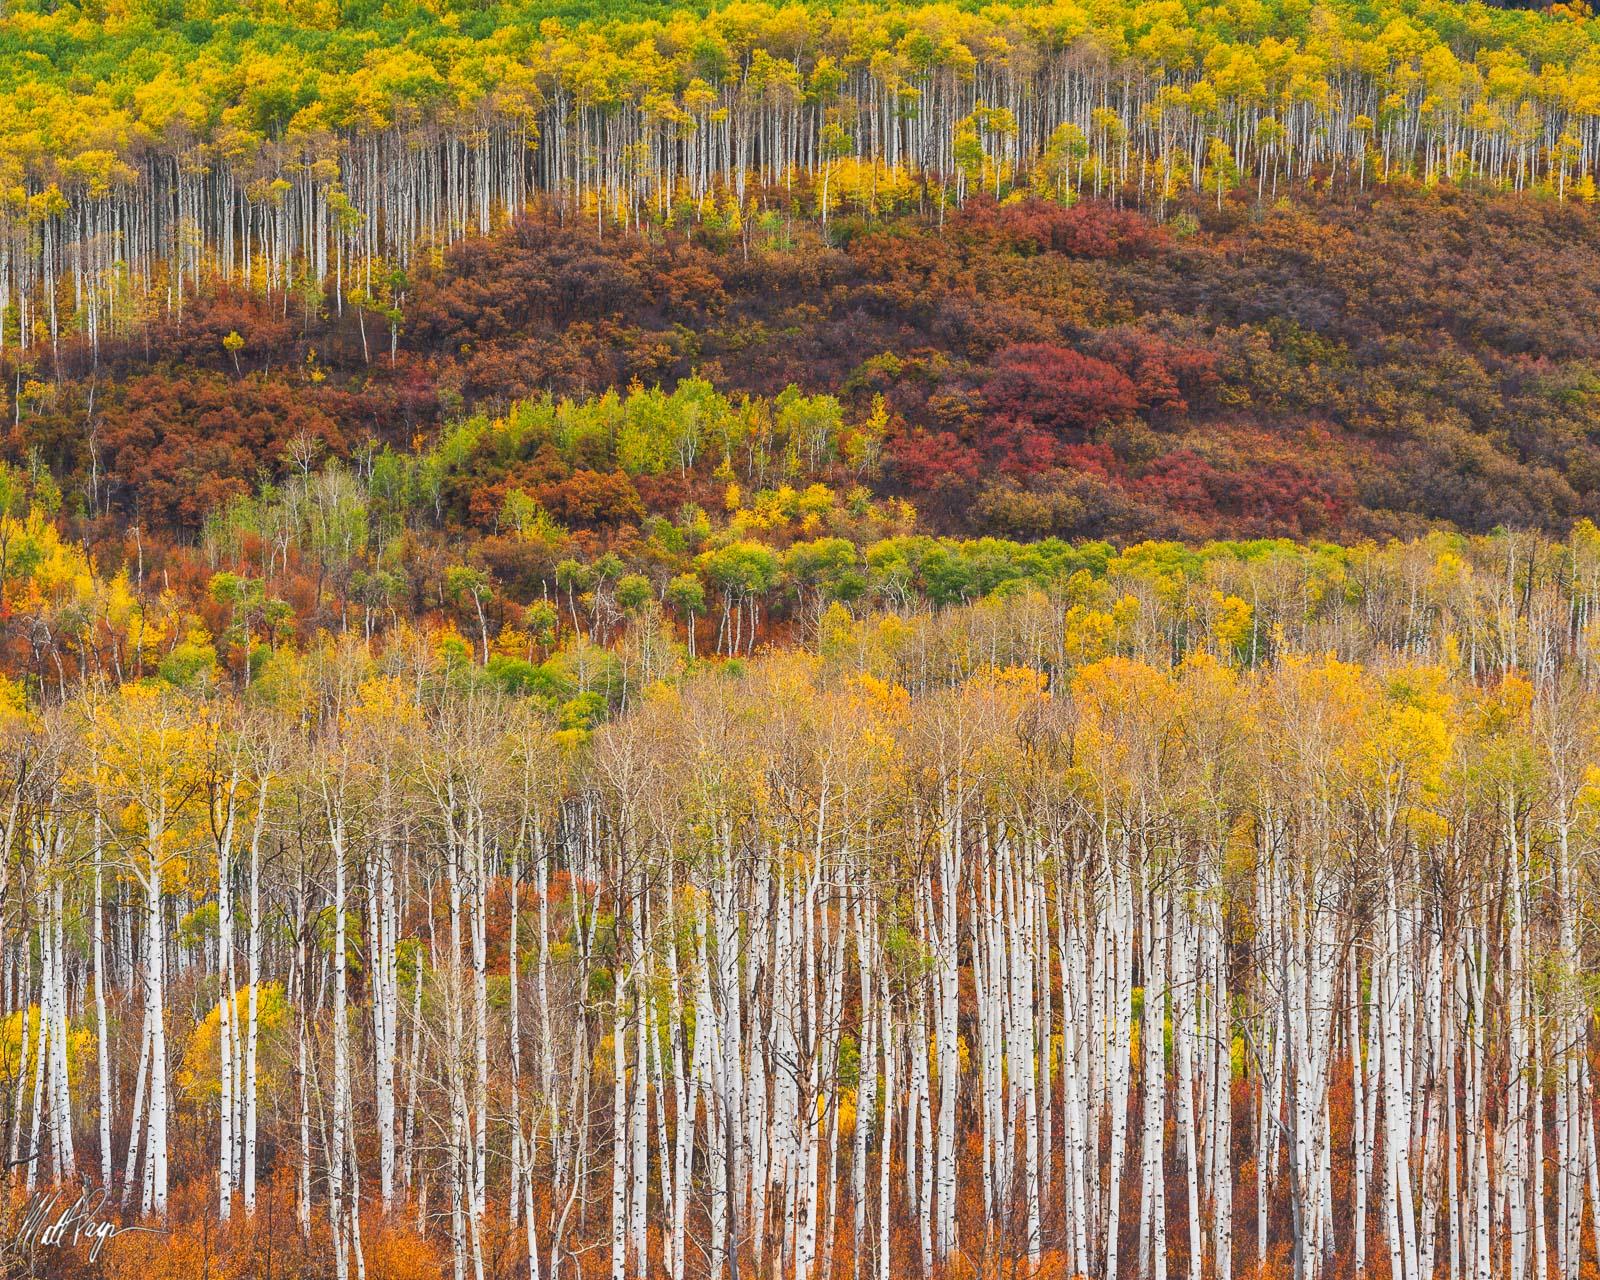 Aspen Trees, Autumn, Colorado, Fall, Fall Colors, Landscape, colorful, scrub oak, McClure Pass, Landscape Photography, photo